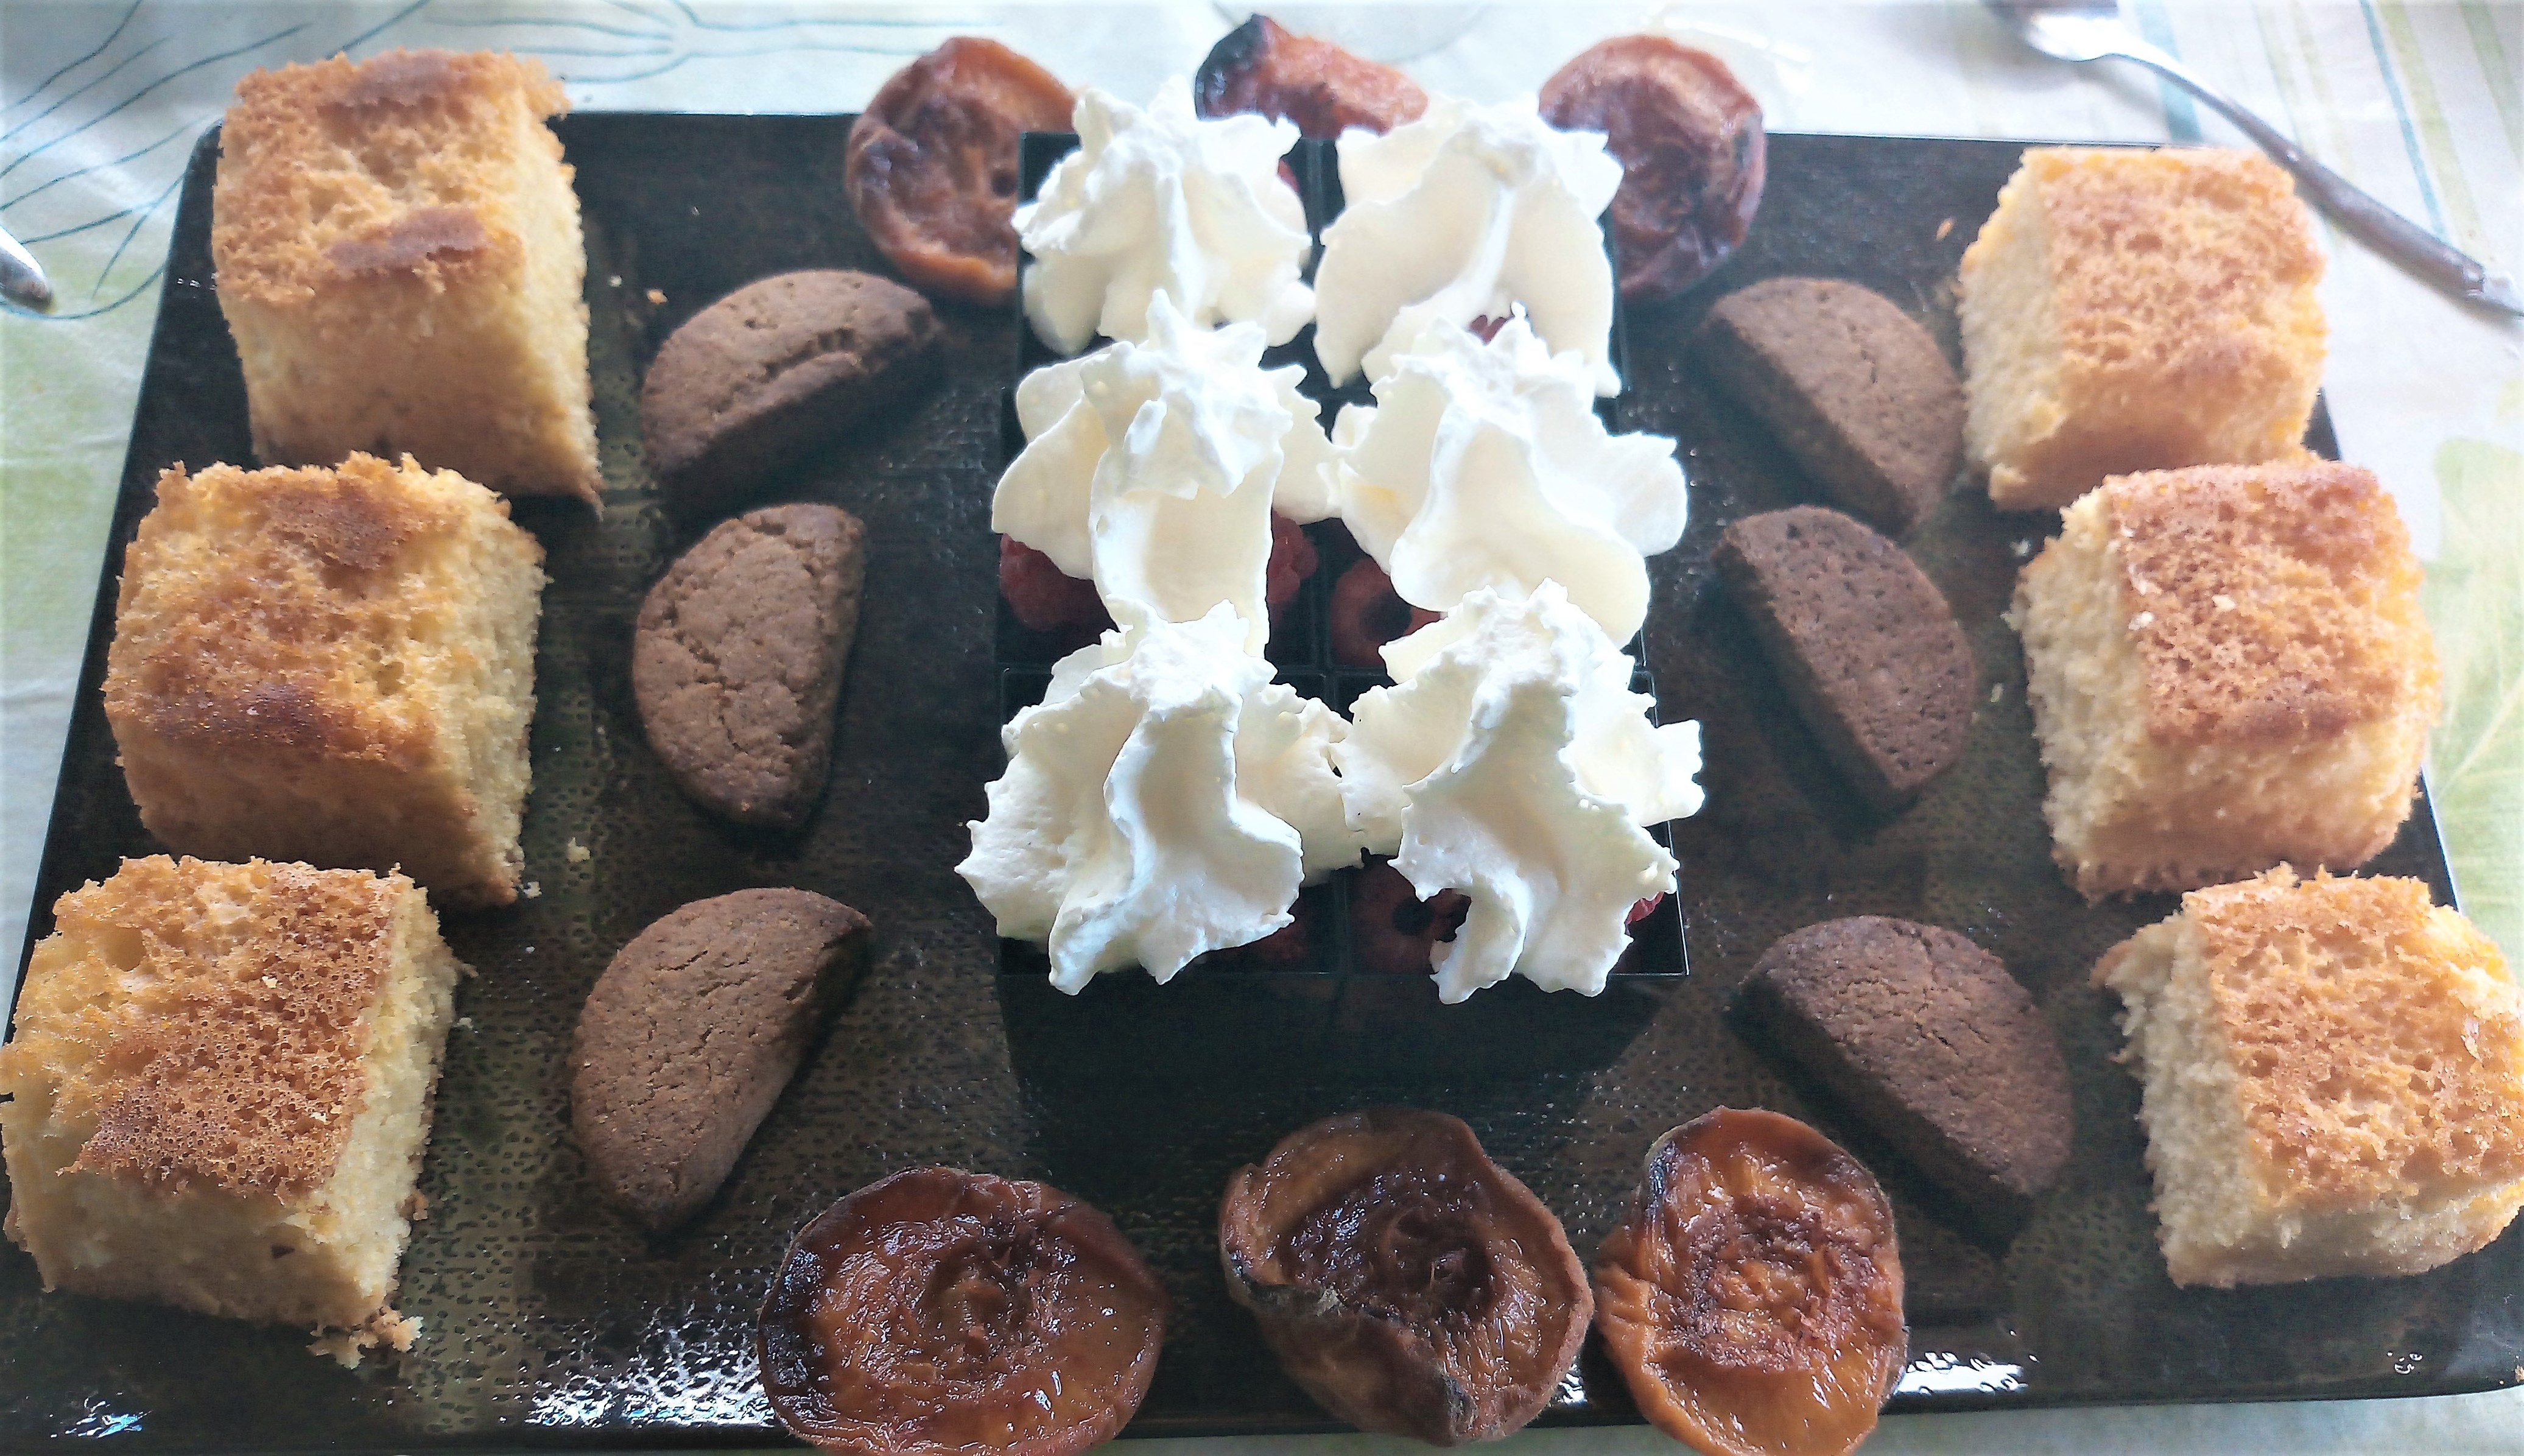 Tapas desserts